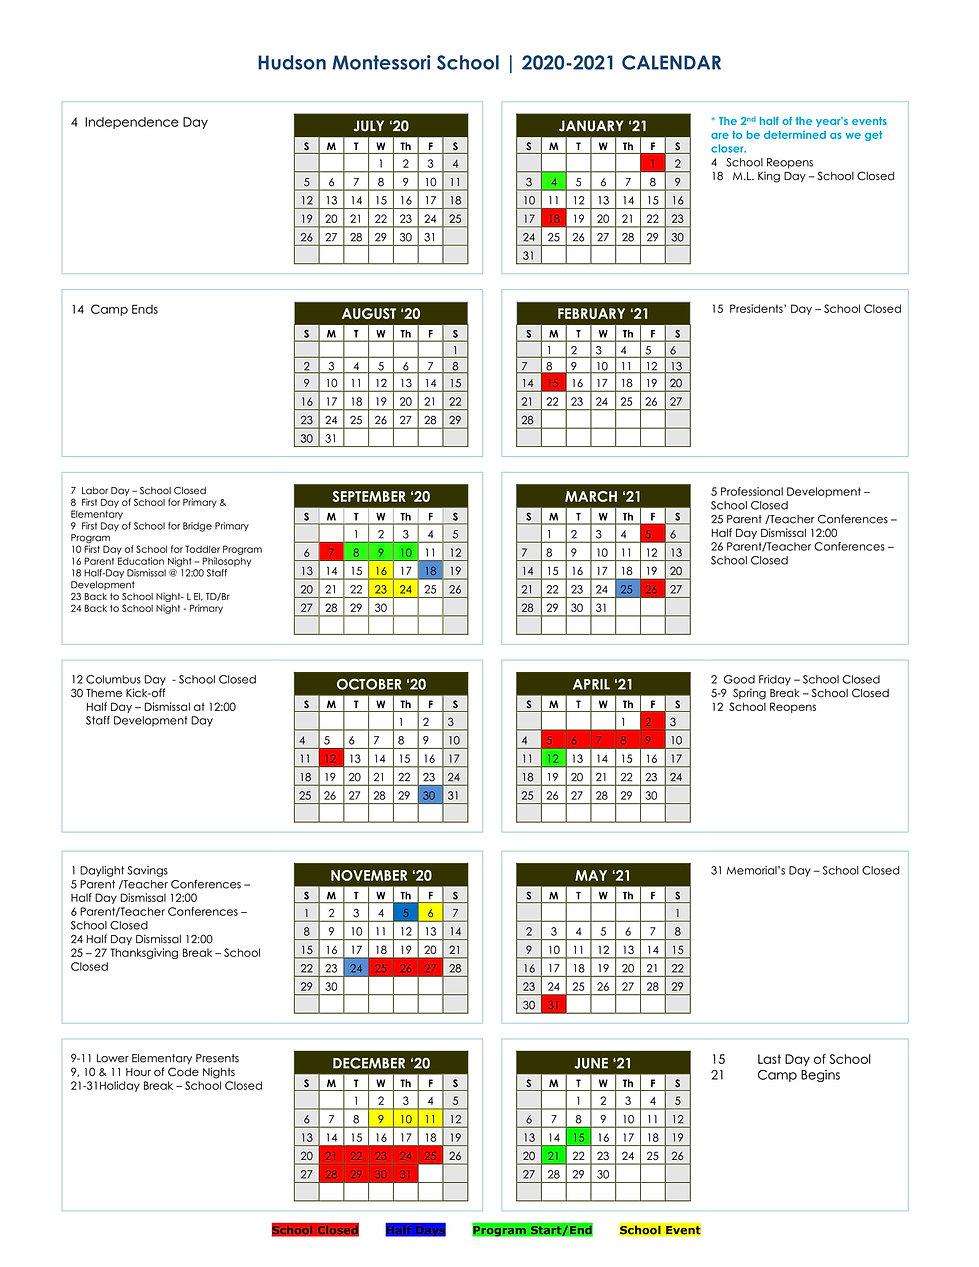 2020-2021 HMS Year-At-A-Glance Calendar-